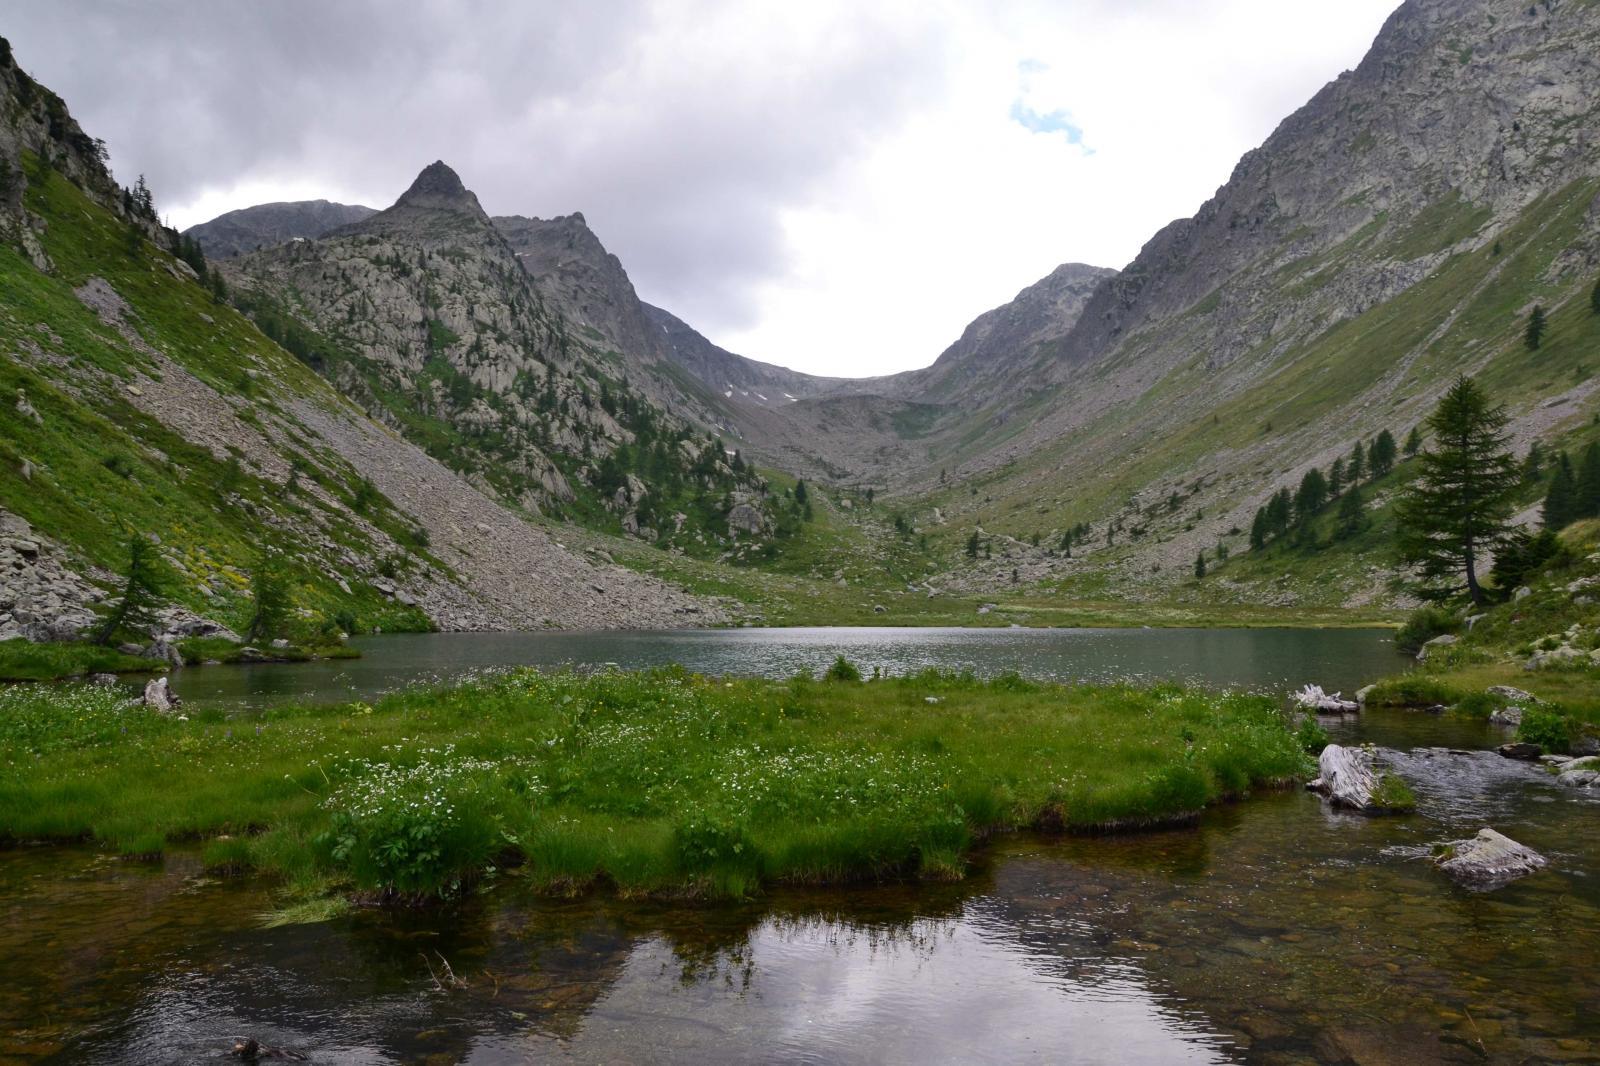 San Bernolfo (Lago di) e Rifugio de Alexandris Foches da San Bernolfo 2014-08-02